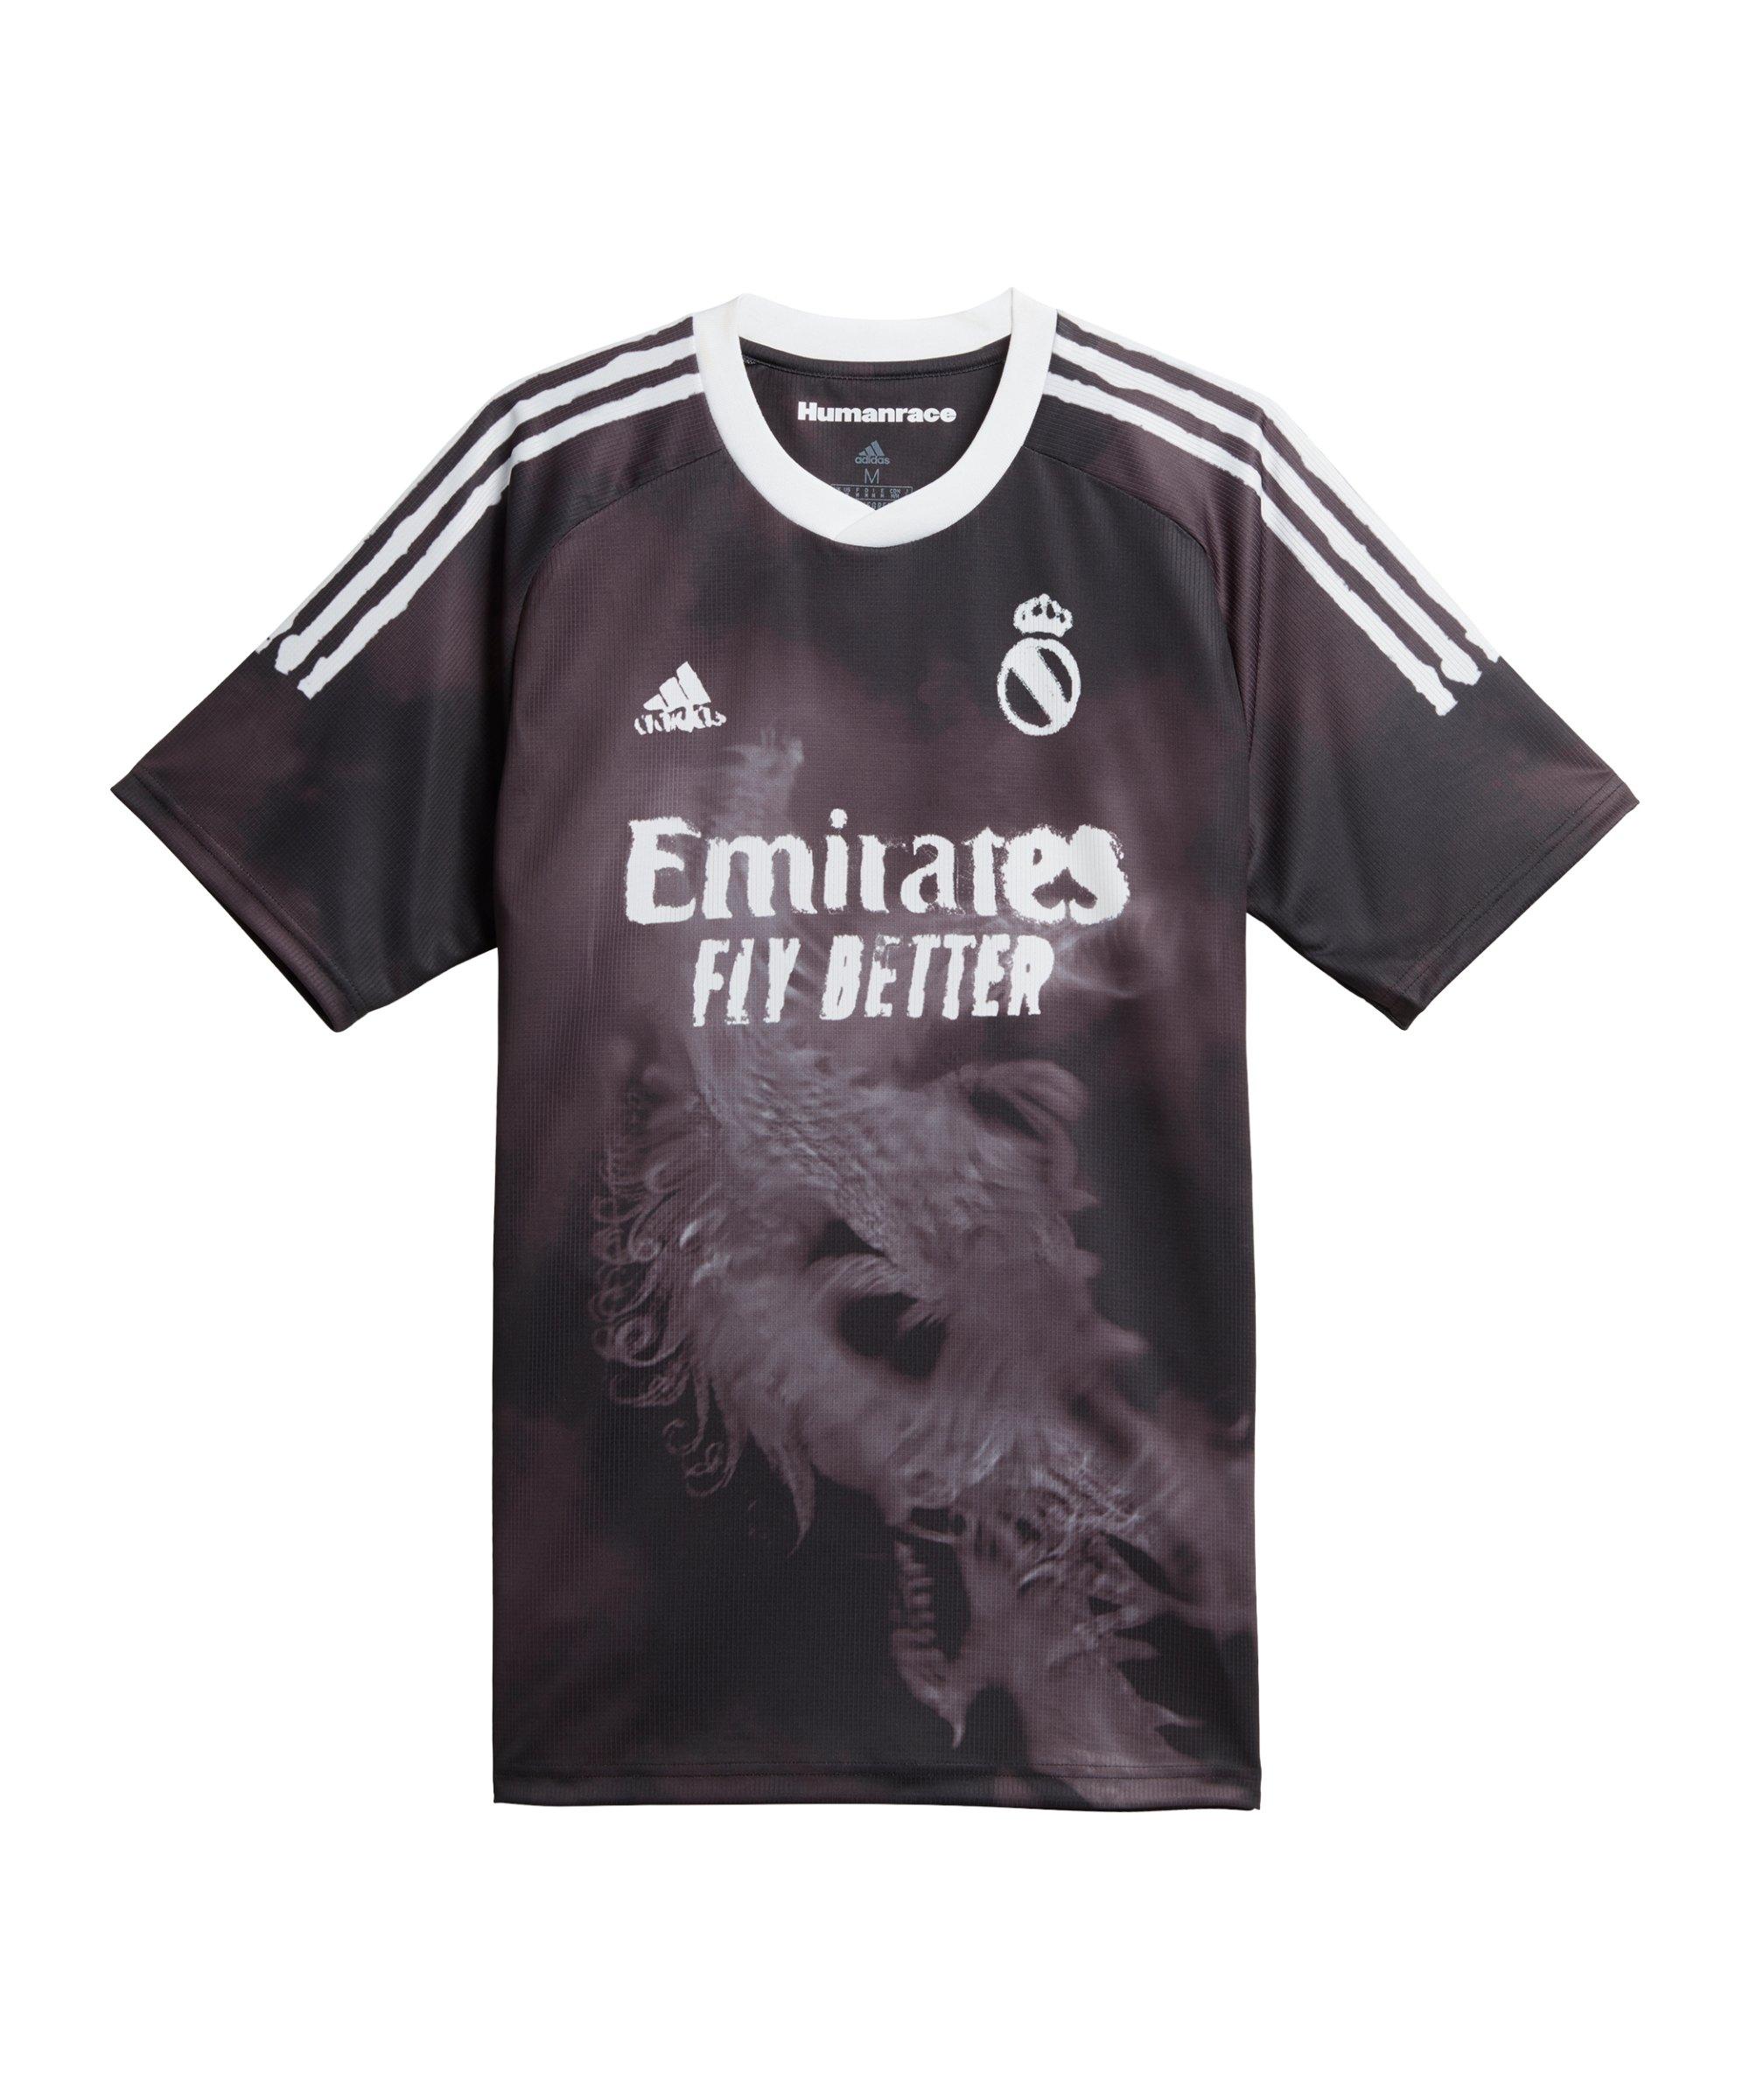 adidas Real Madrid Human Race Trikot Schwarz Weiss - schwarz